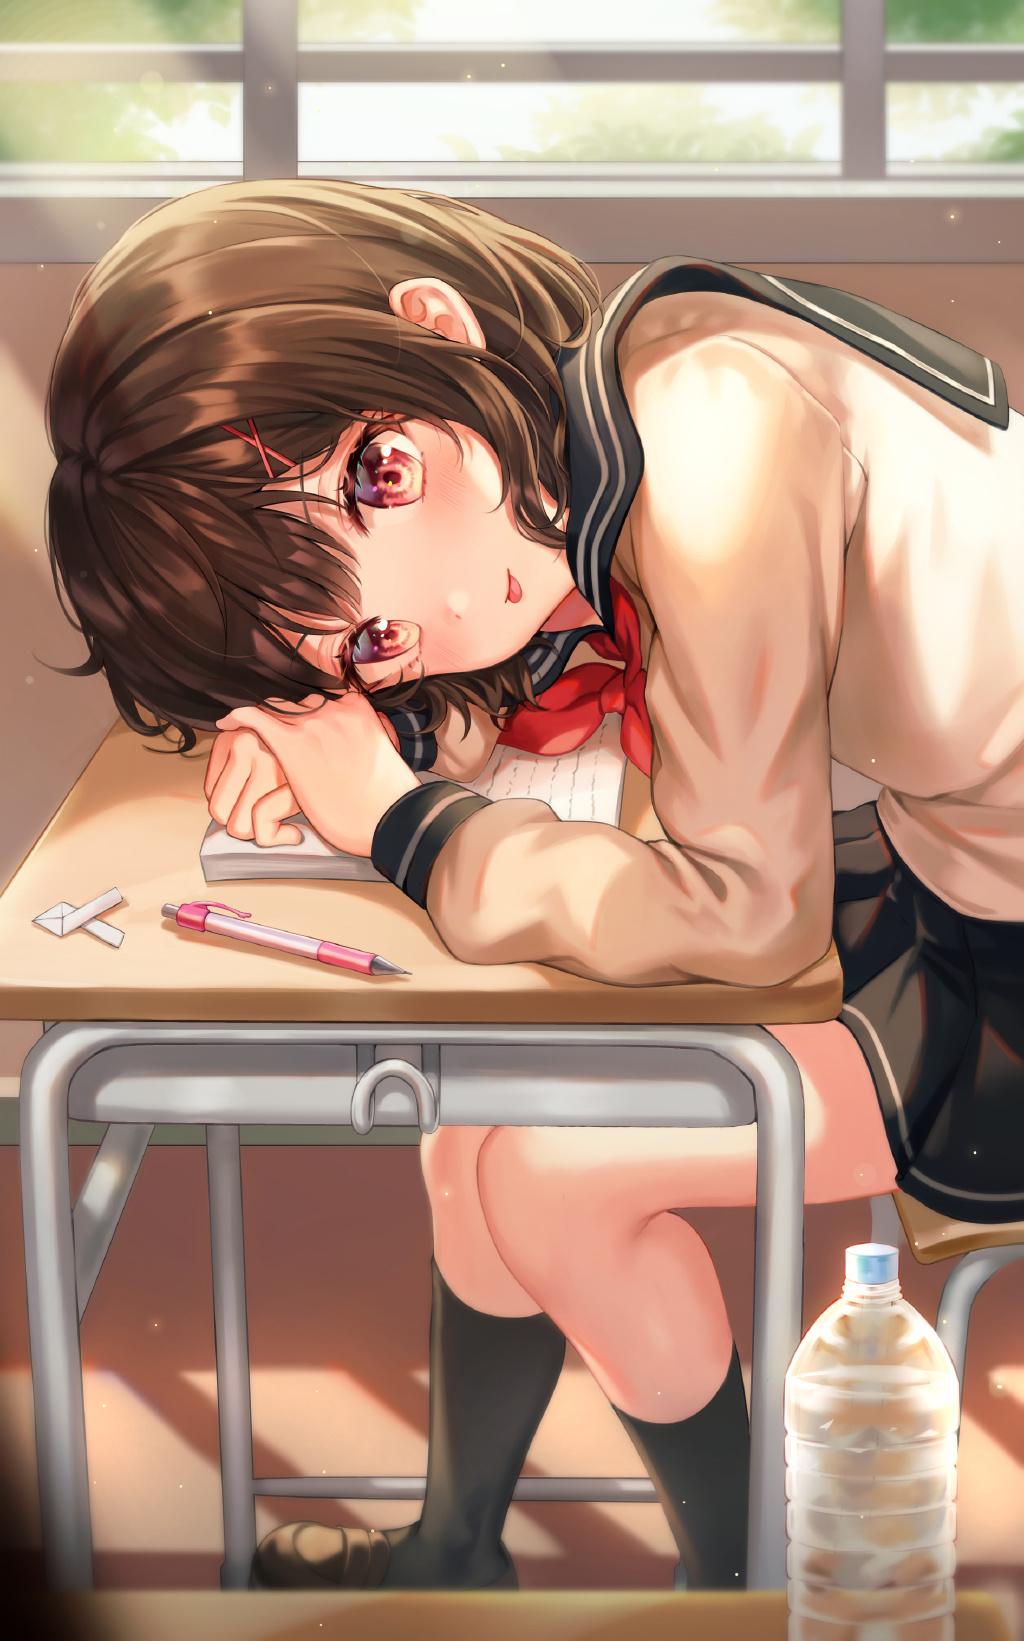 【P站画师】老婆真的非常可爱!韩国画师TOKKYU的插画作品- ACG17.COM